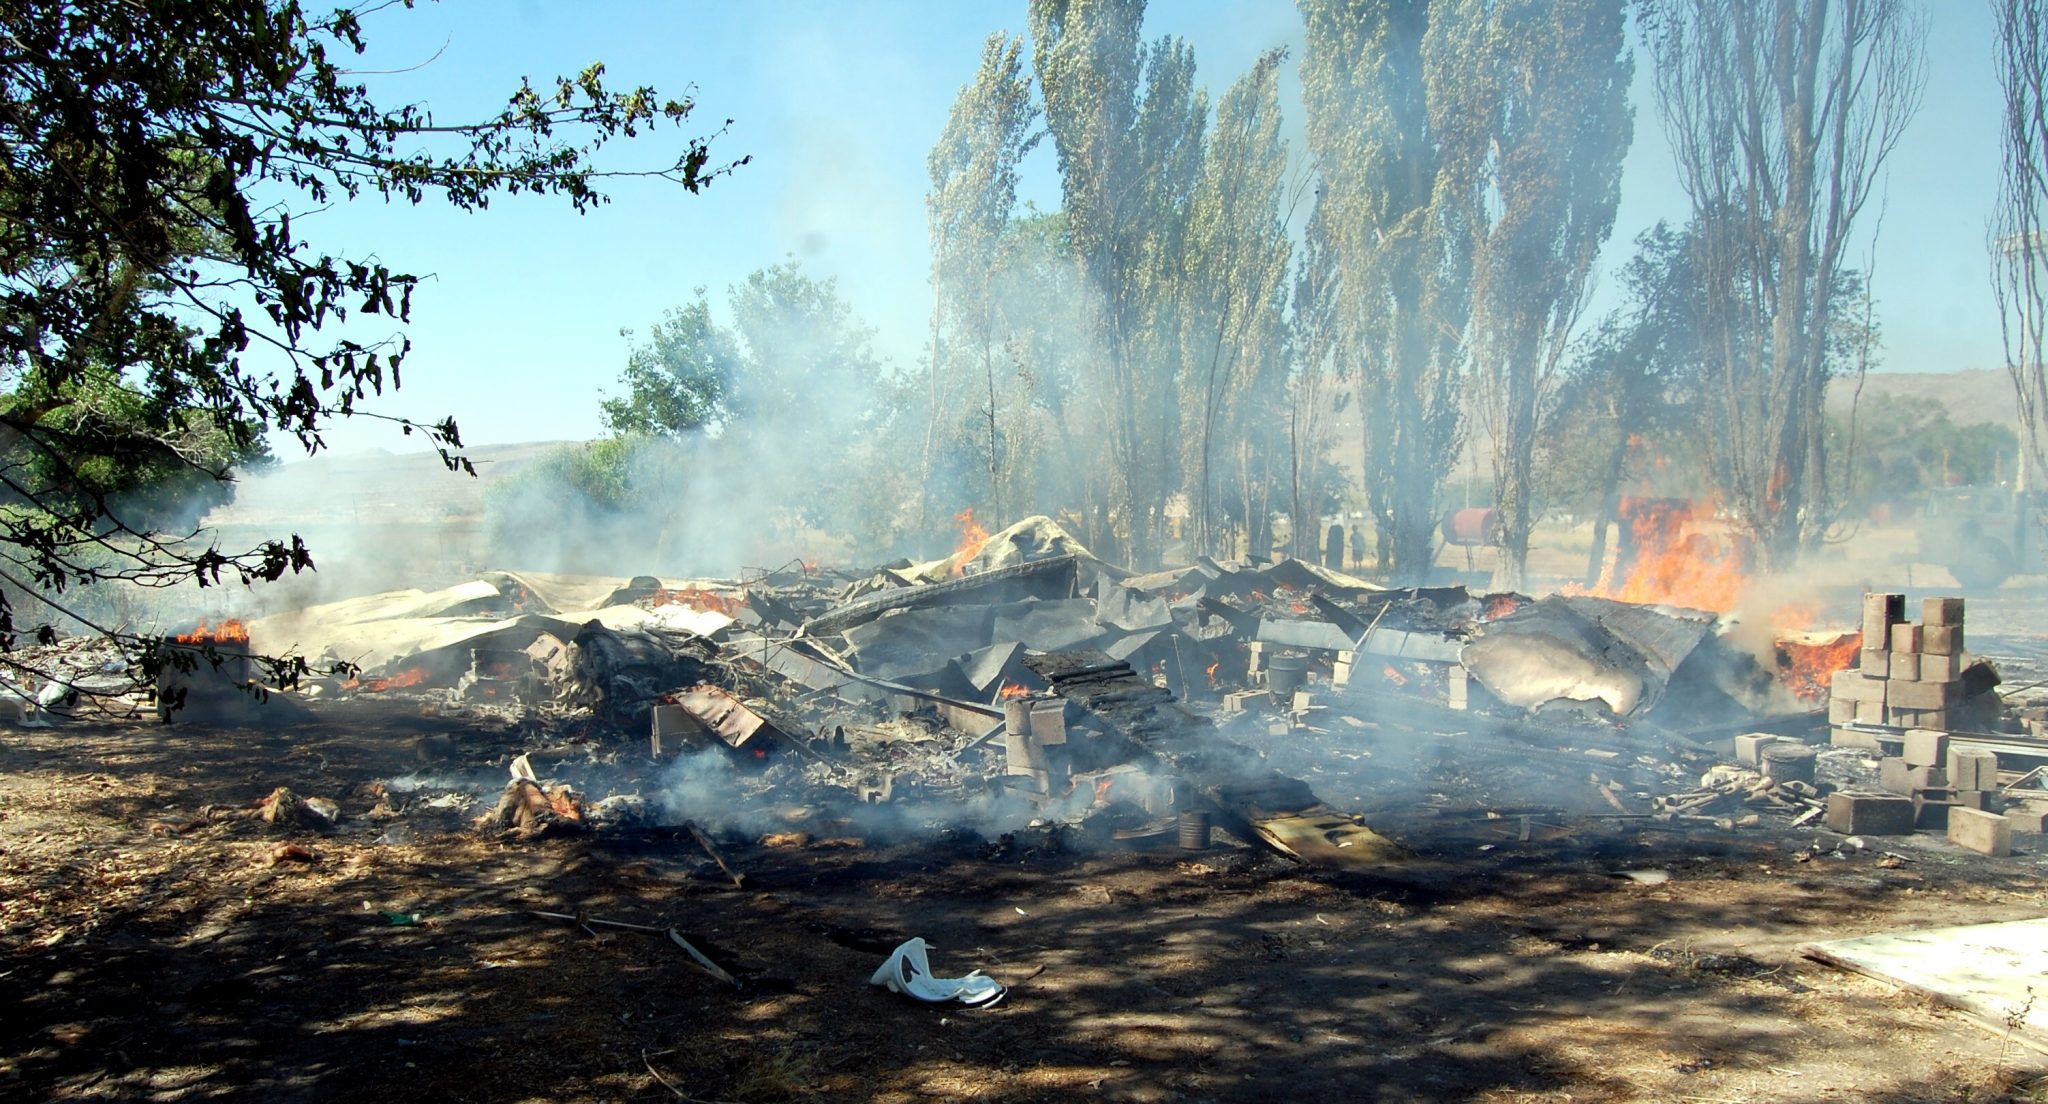 Fire destroys three Alamo abandoned mobile homes